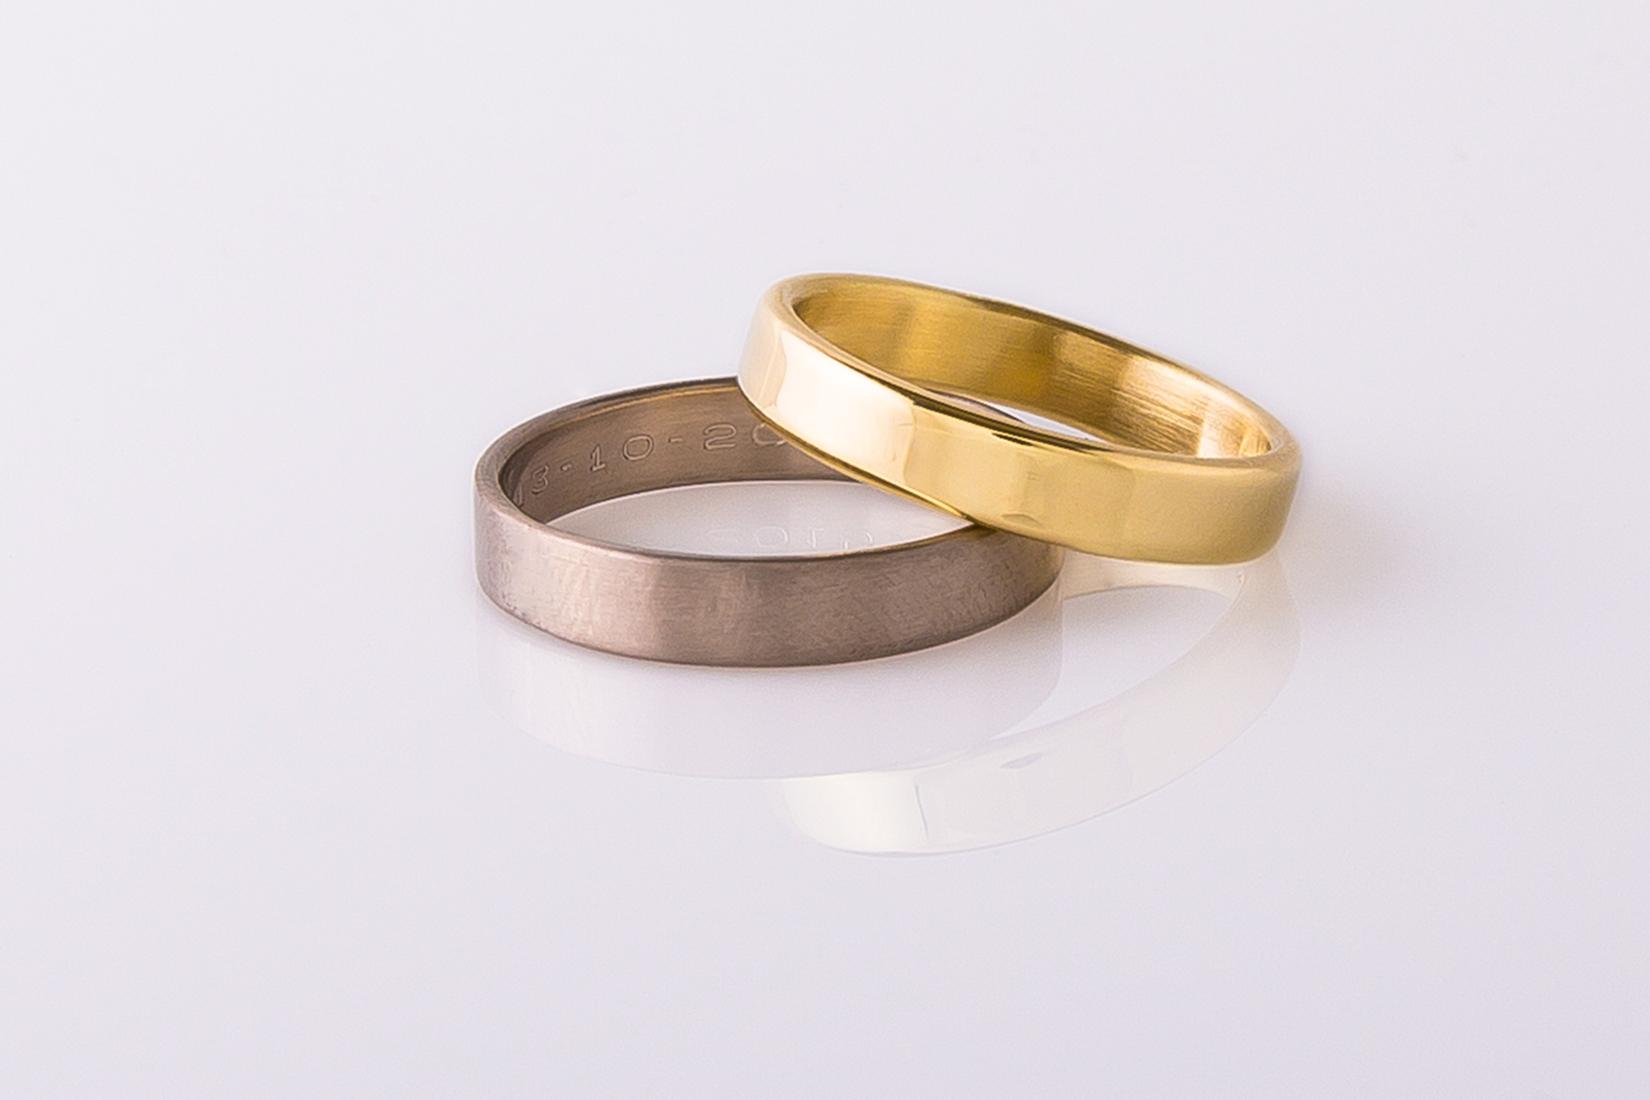 goudmerk-ring-trouwen-wit-geel-goud-hoogglans-gegraveerd